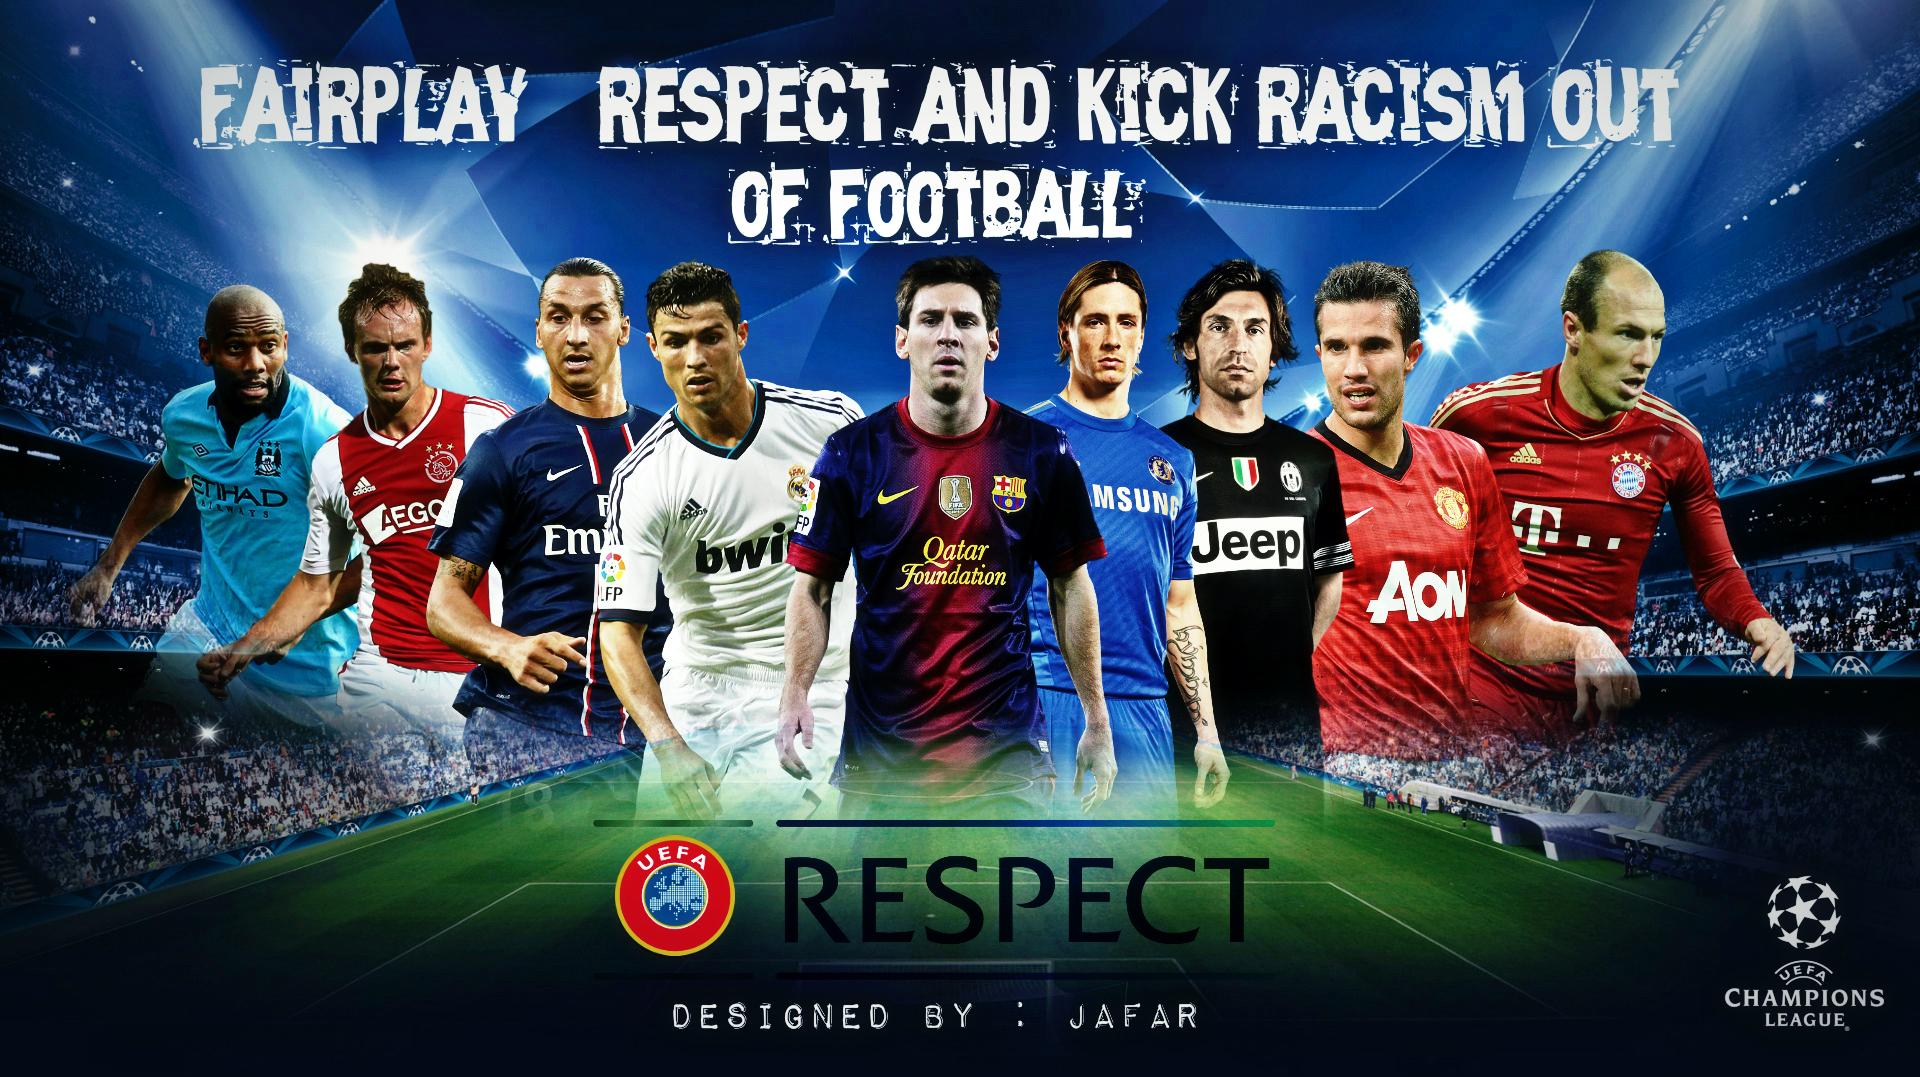 UEFA CHAMPIONS LEAGUE WALLPAPER 2012 13 wallpaper   ForWallpapercom 1920x1077